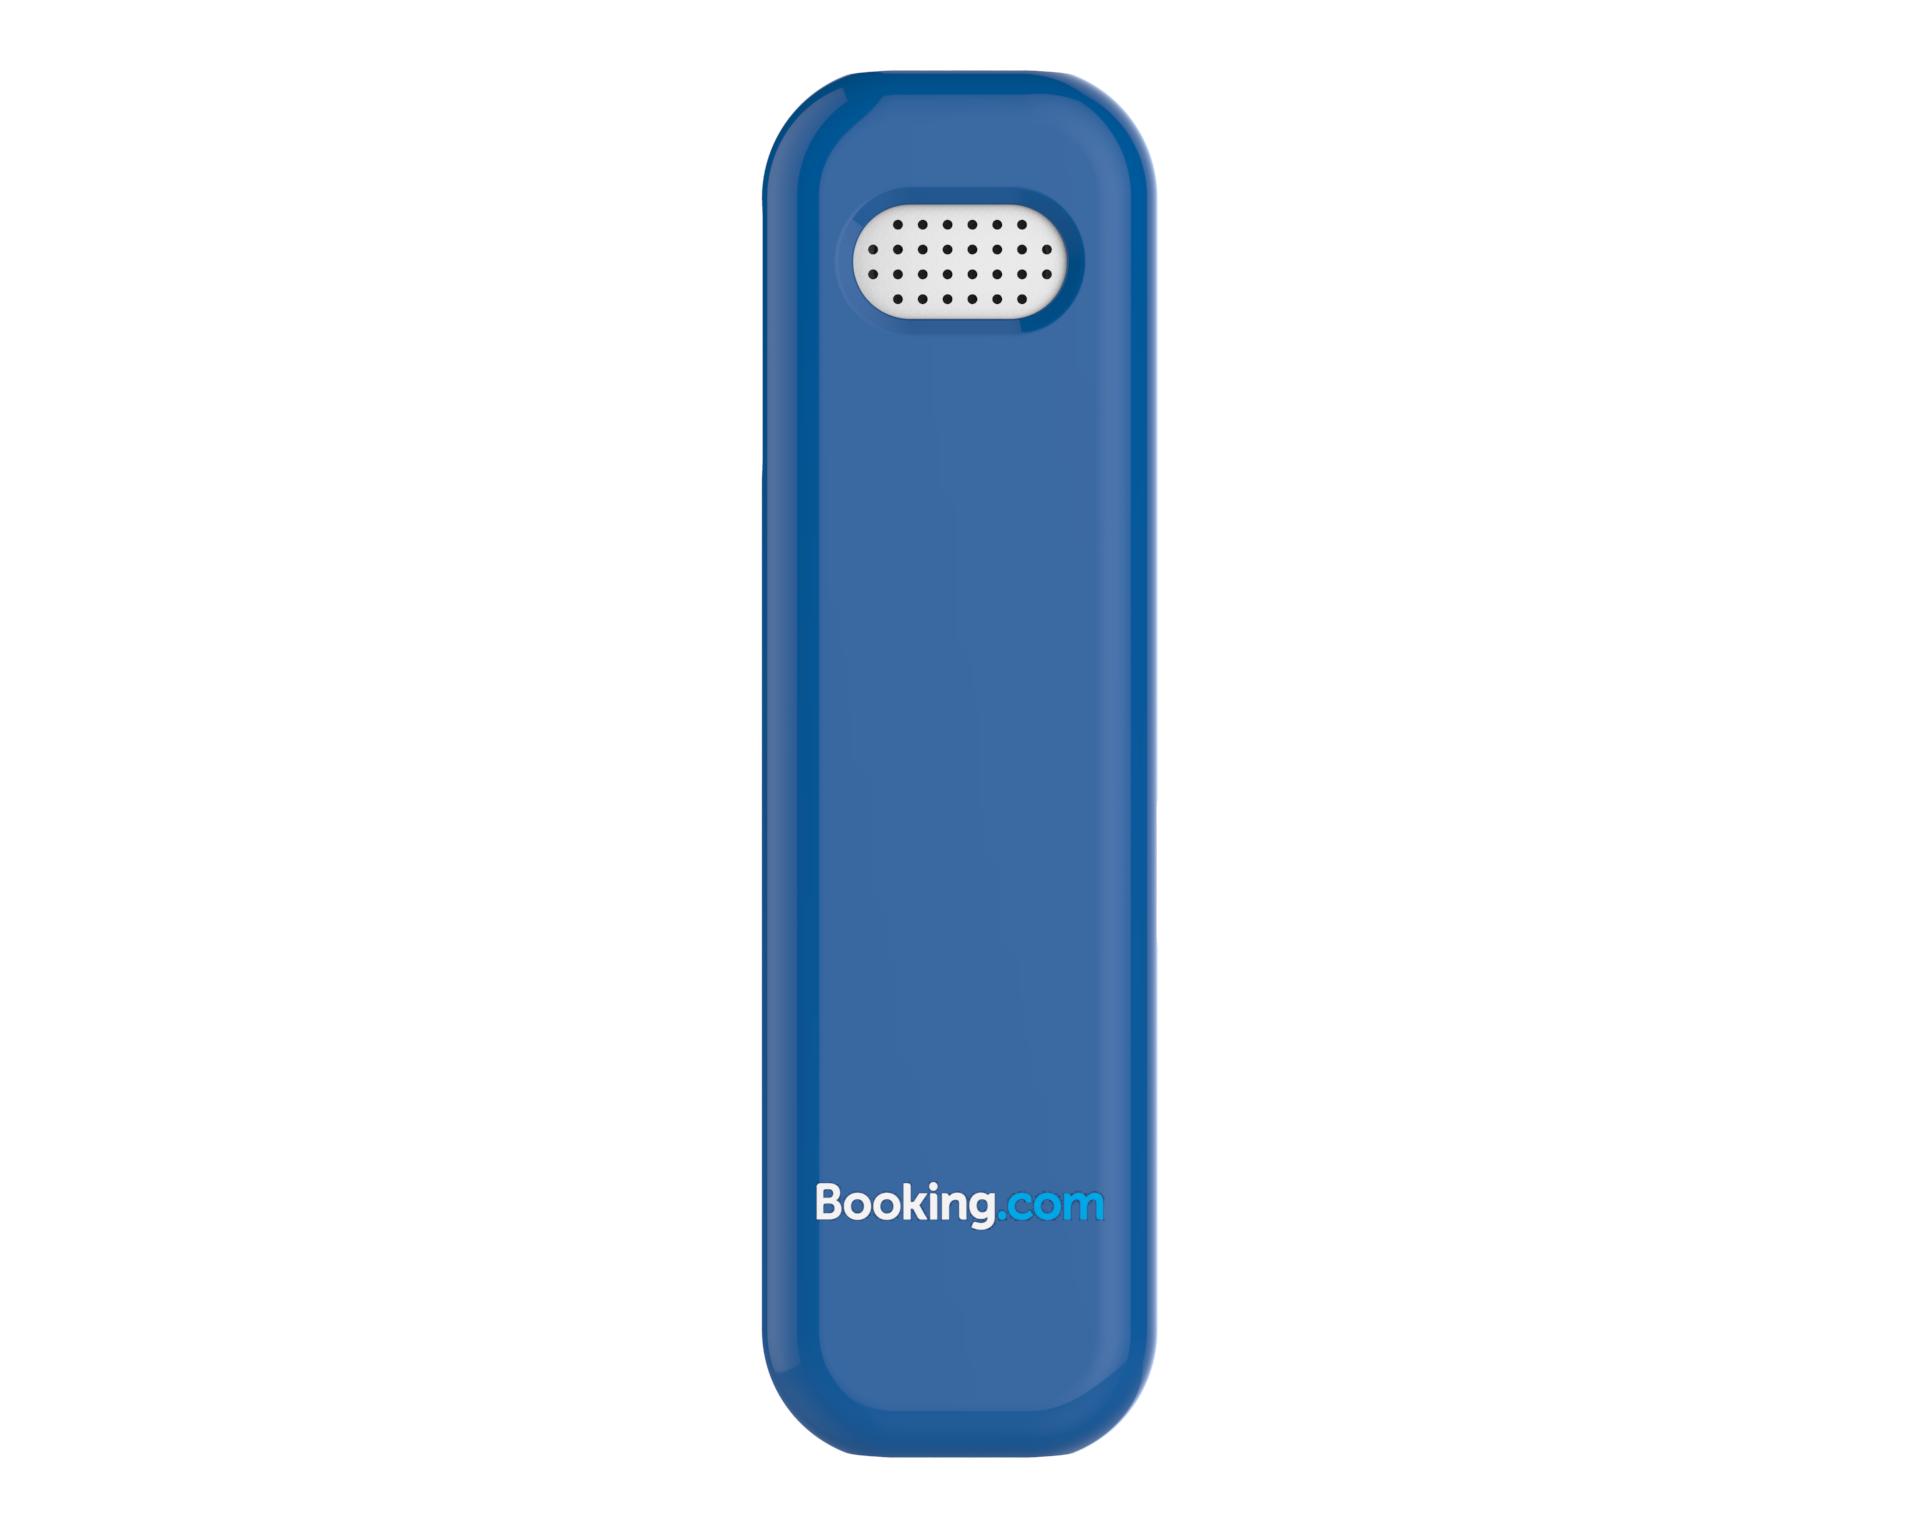 Booking.com x ili 推旅行佳品 Booking.com 包裝限量 ili 翻譯機